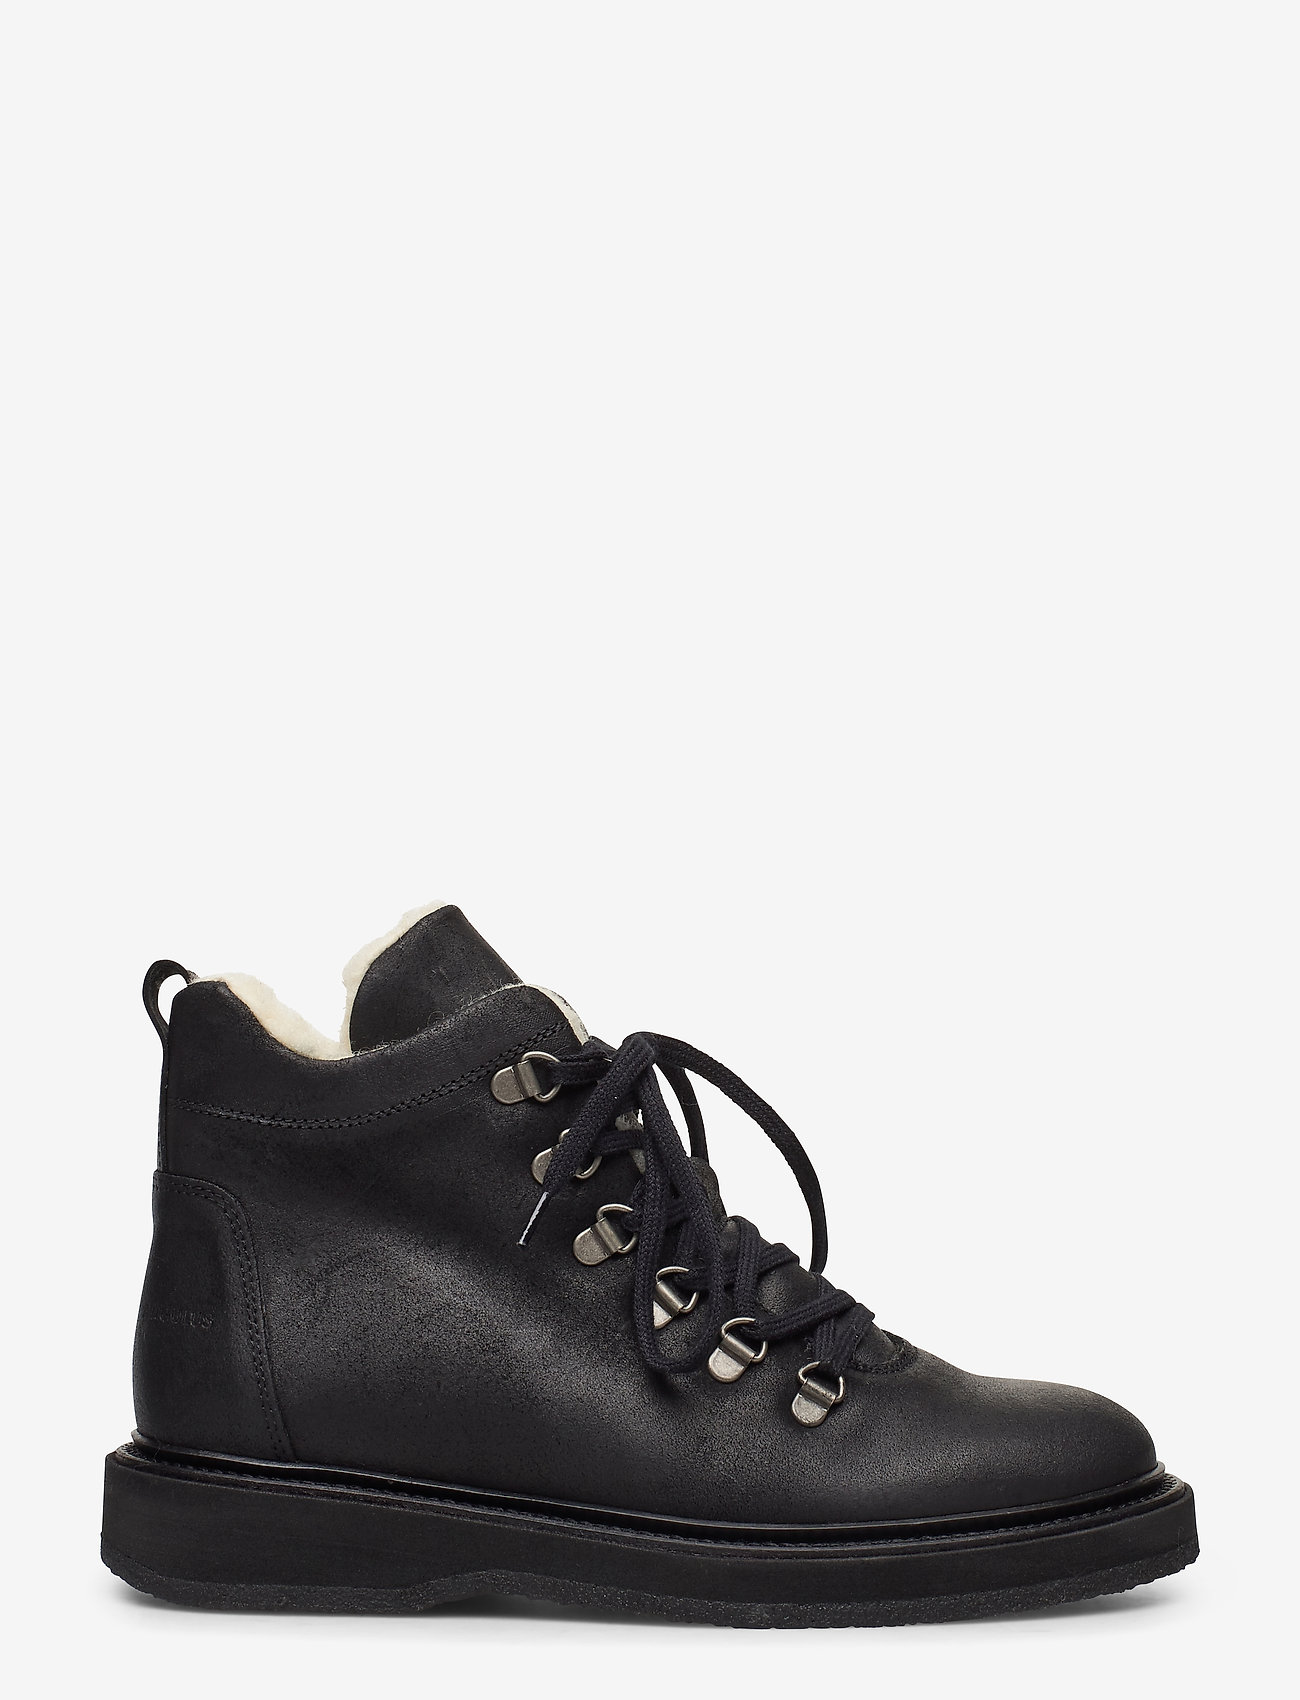 ANGULUS - Boots - flat - flache stiefeletten - 2100 black - 1